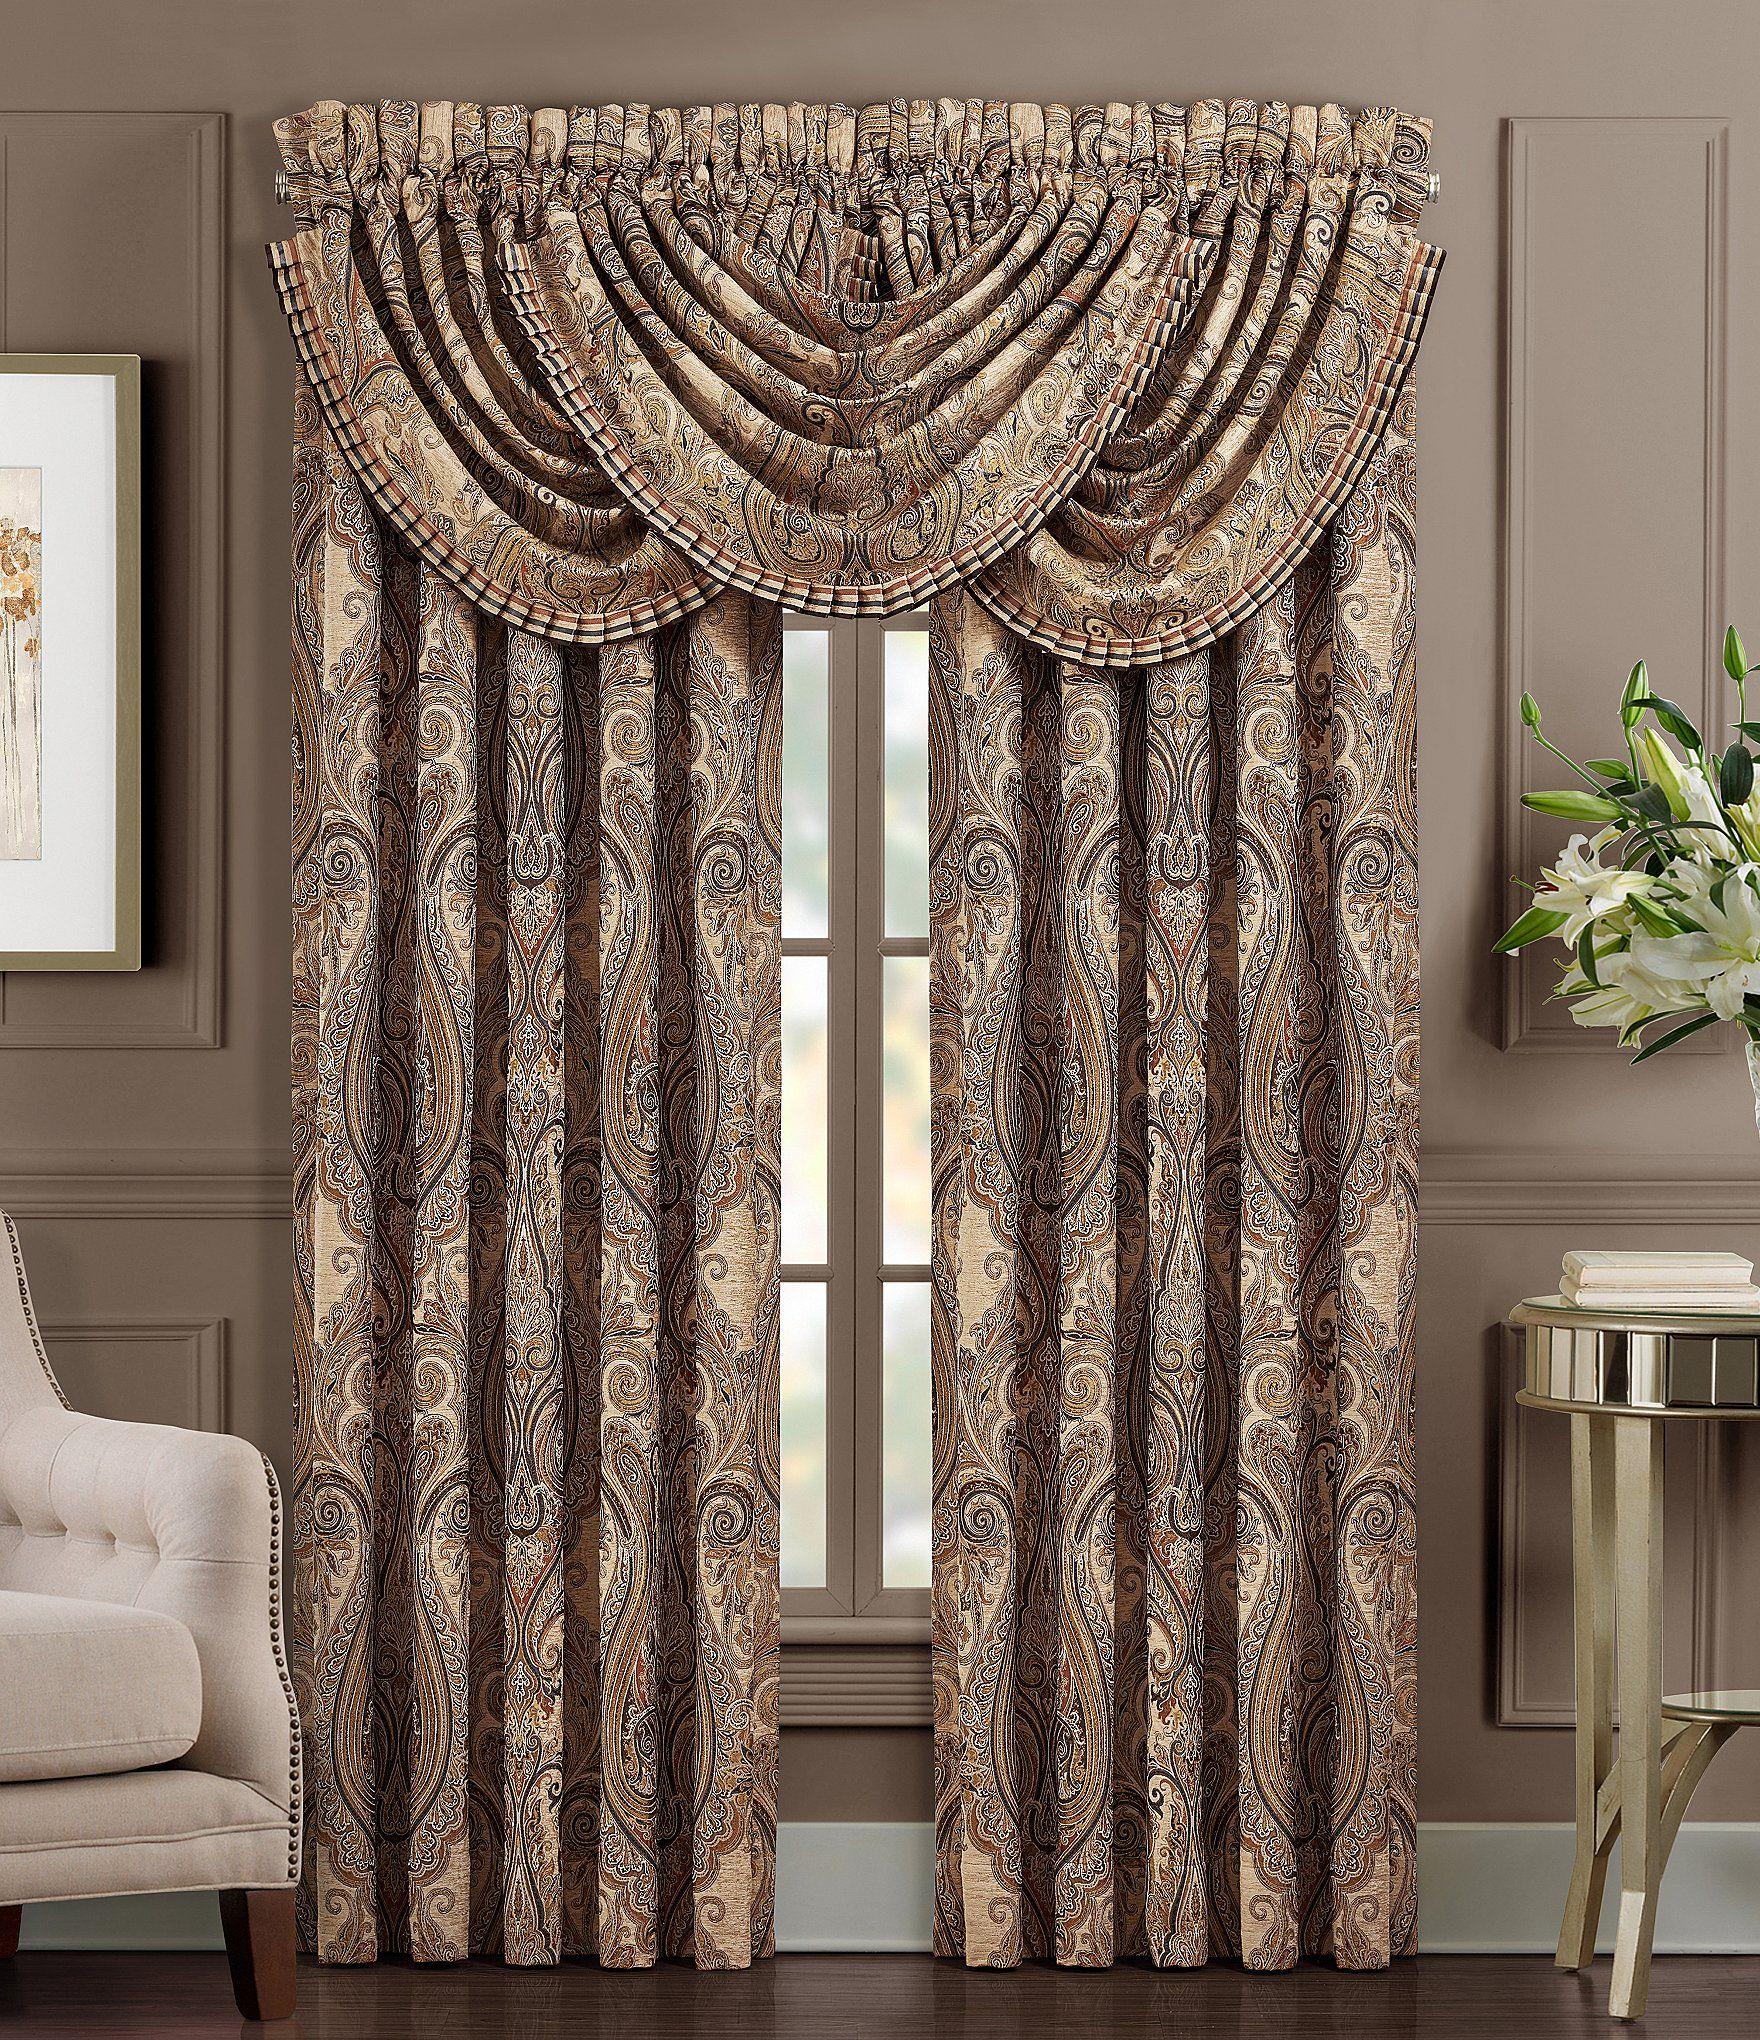 J Queen New York Luciana Window Treatments Dillard S Fancy Living Rooms Fancy Curtains Elegant Curtains